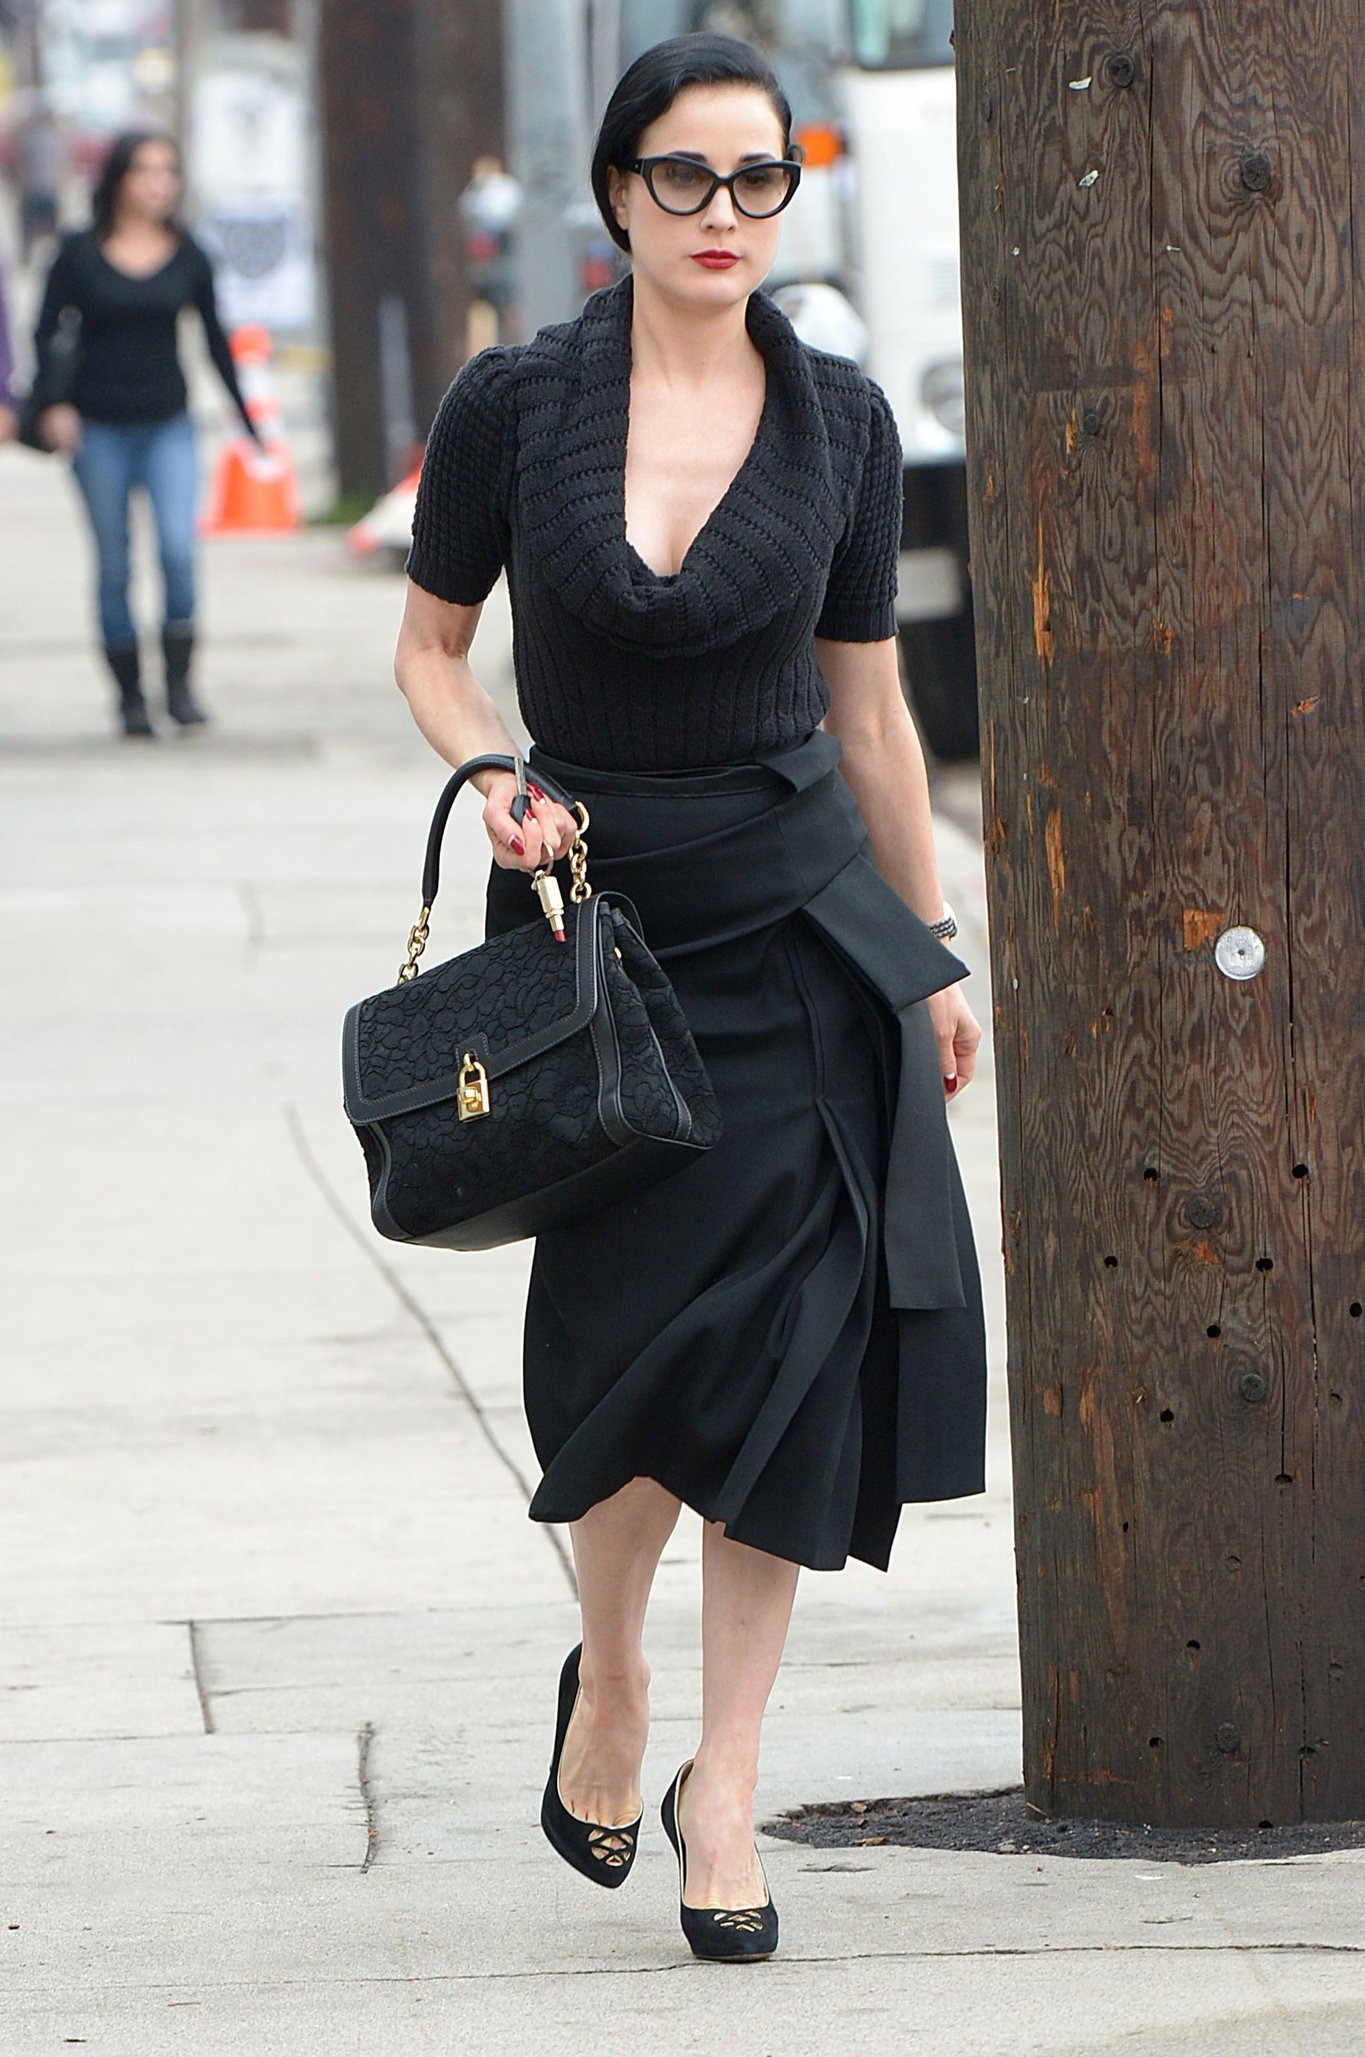 Dita von Teese Leaving Real Food Daily in West Hollywood (November 15, 2012)